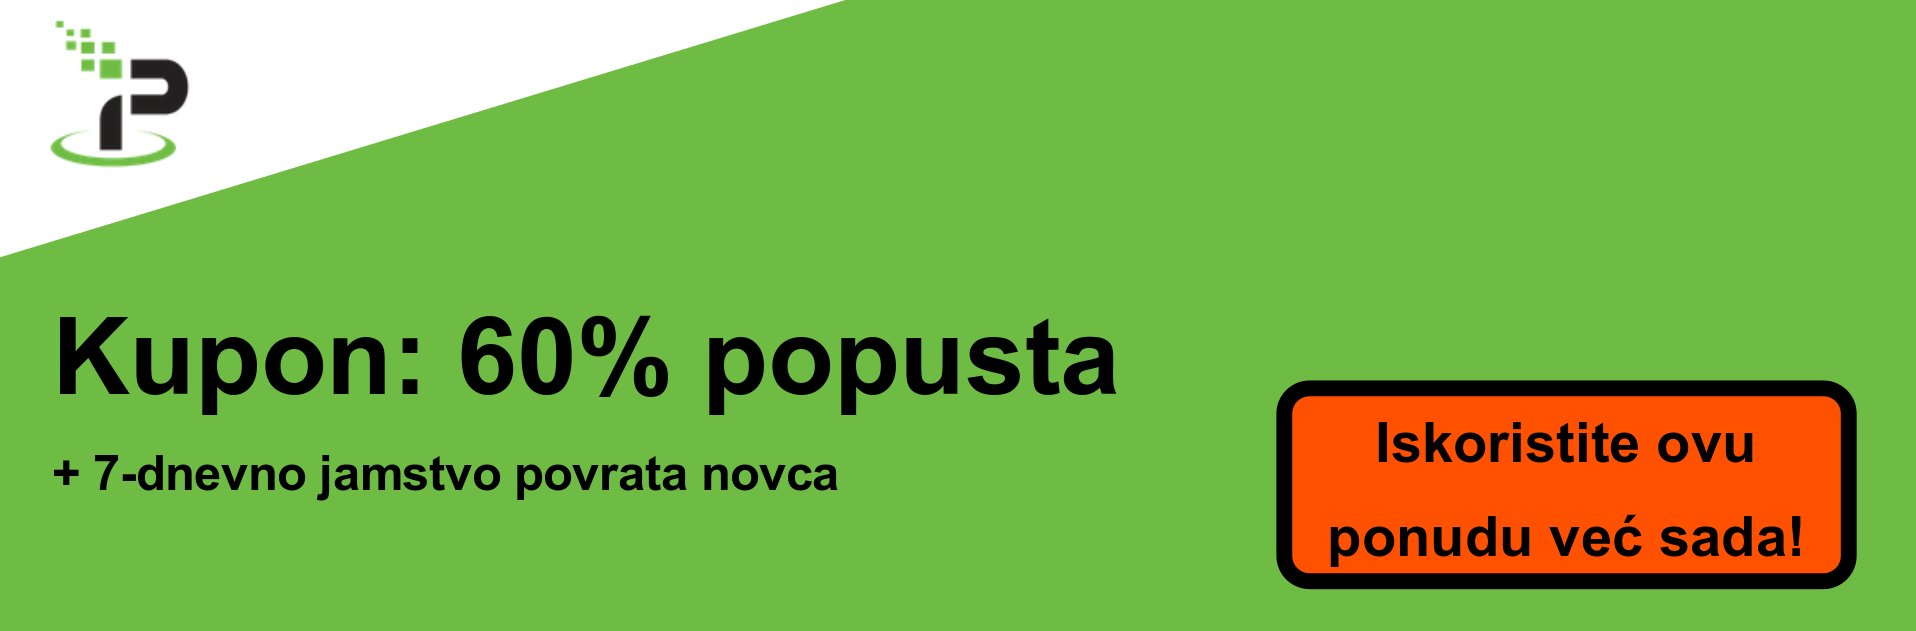 IPVanish kupon banner - 60% popusta